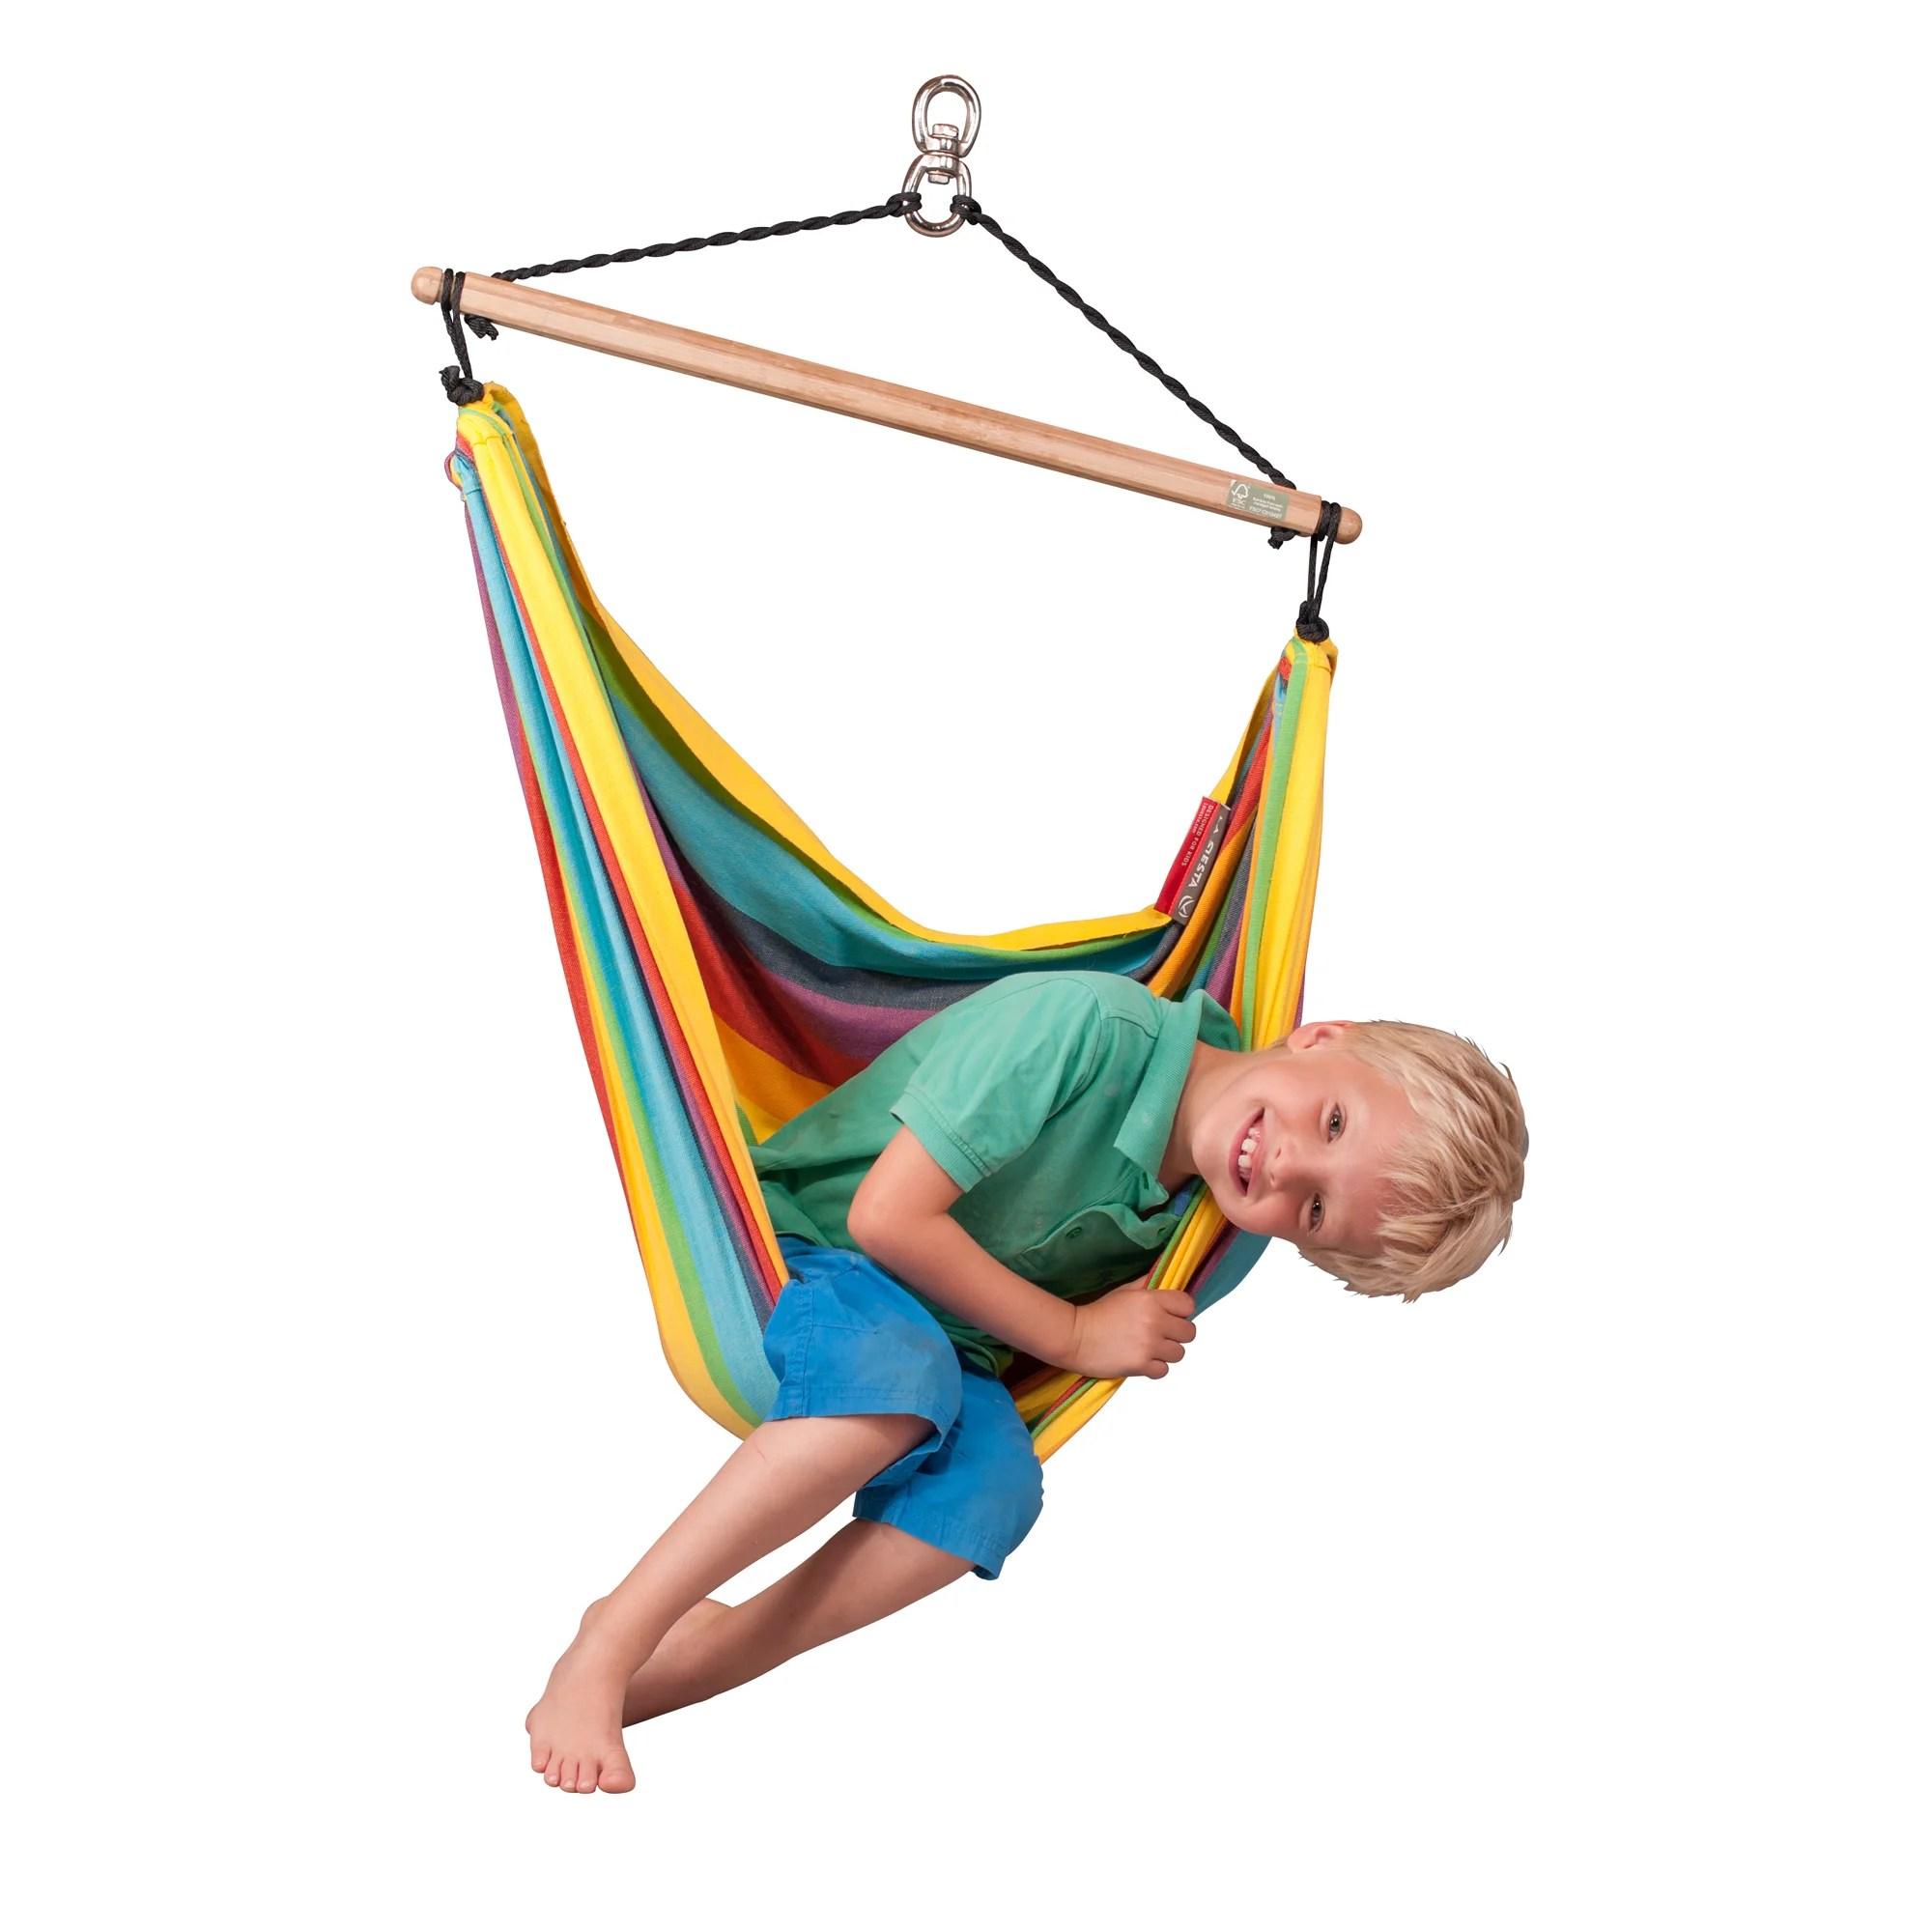 la siesta hammock chair kd smart australia iri organic for kids and reviews